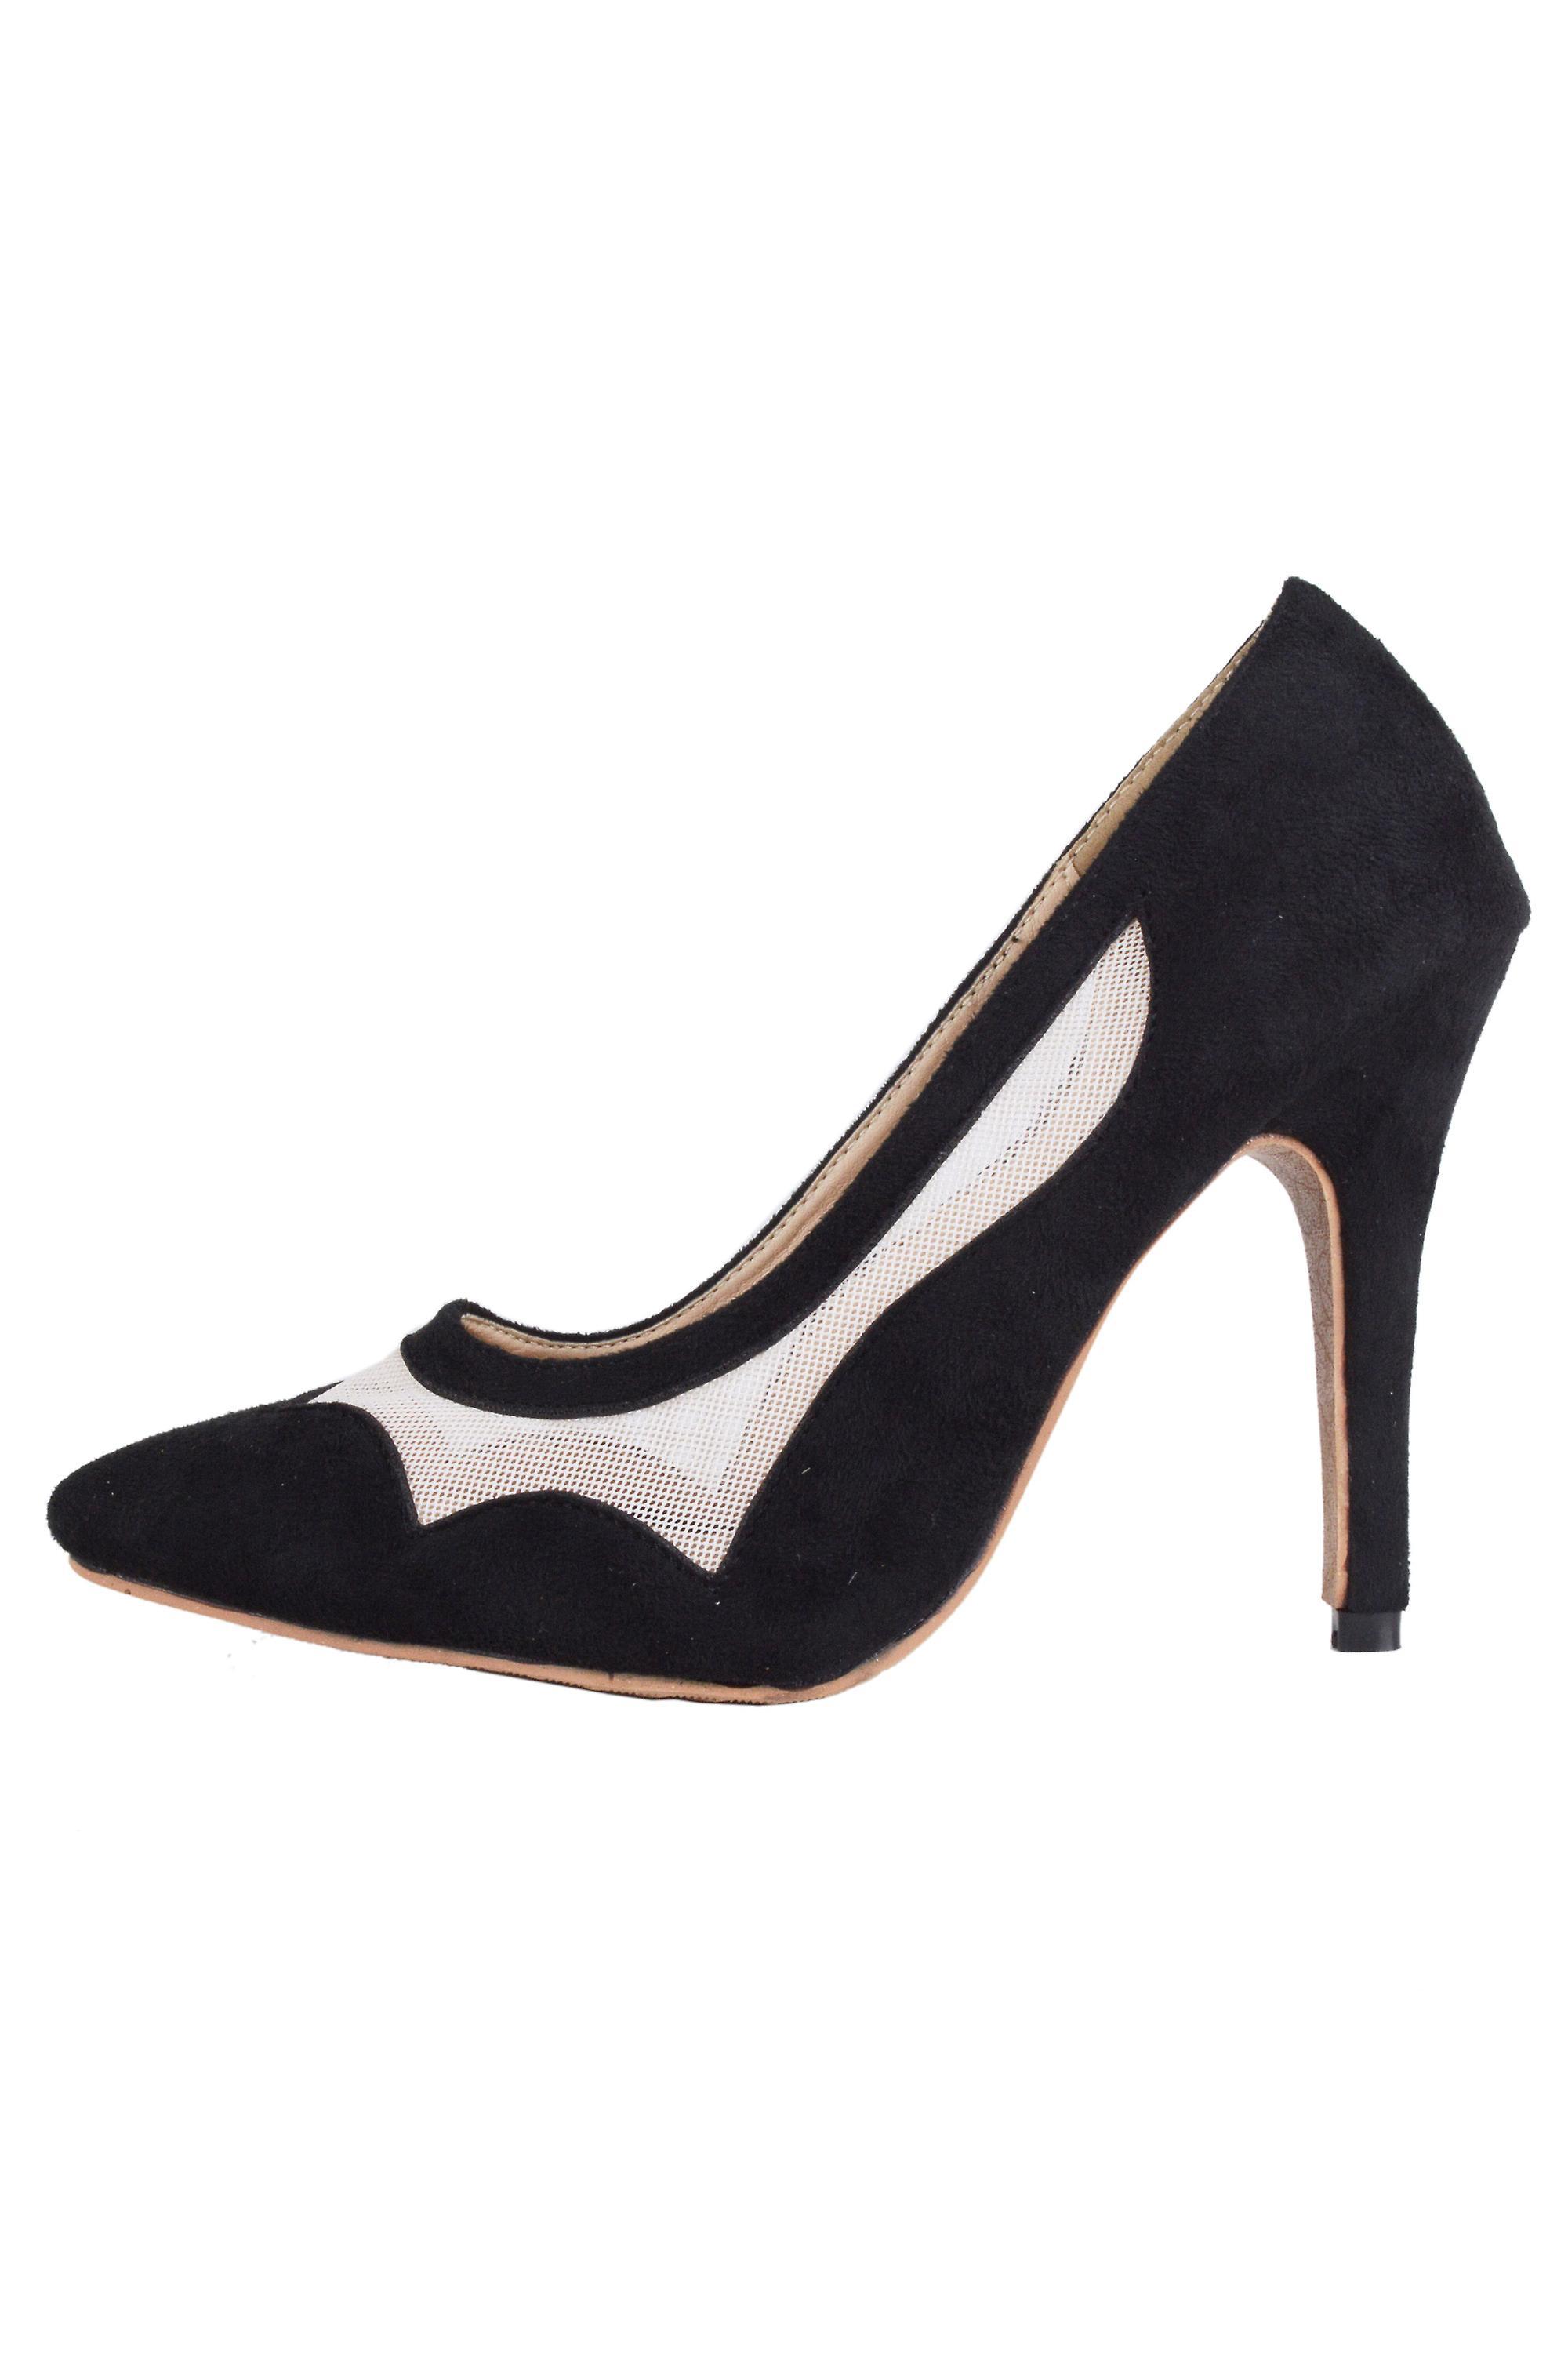 Lovemystyle Black High Heels With White Mesh Insert